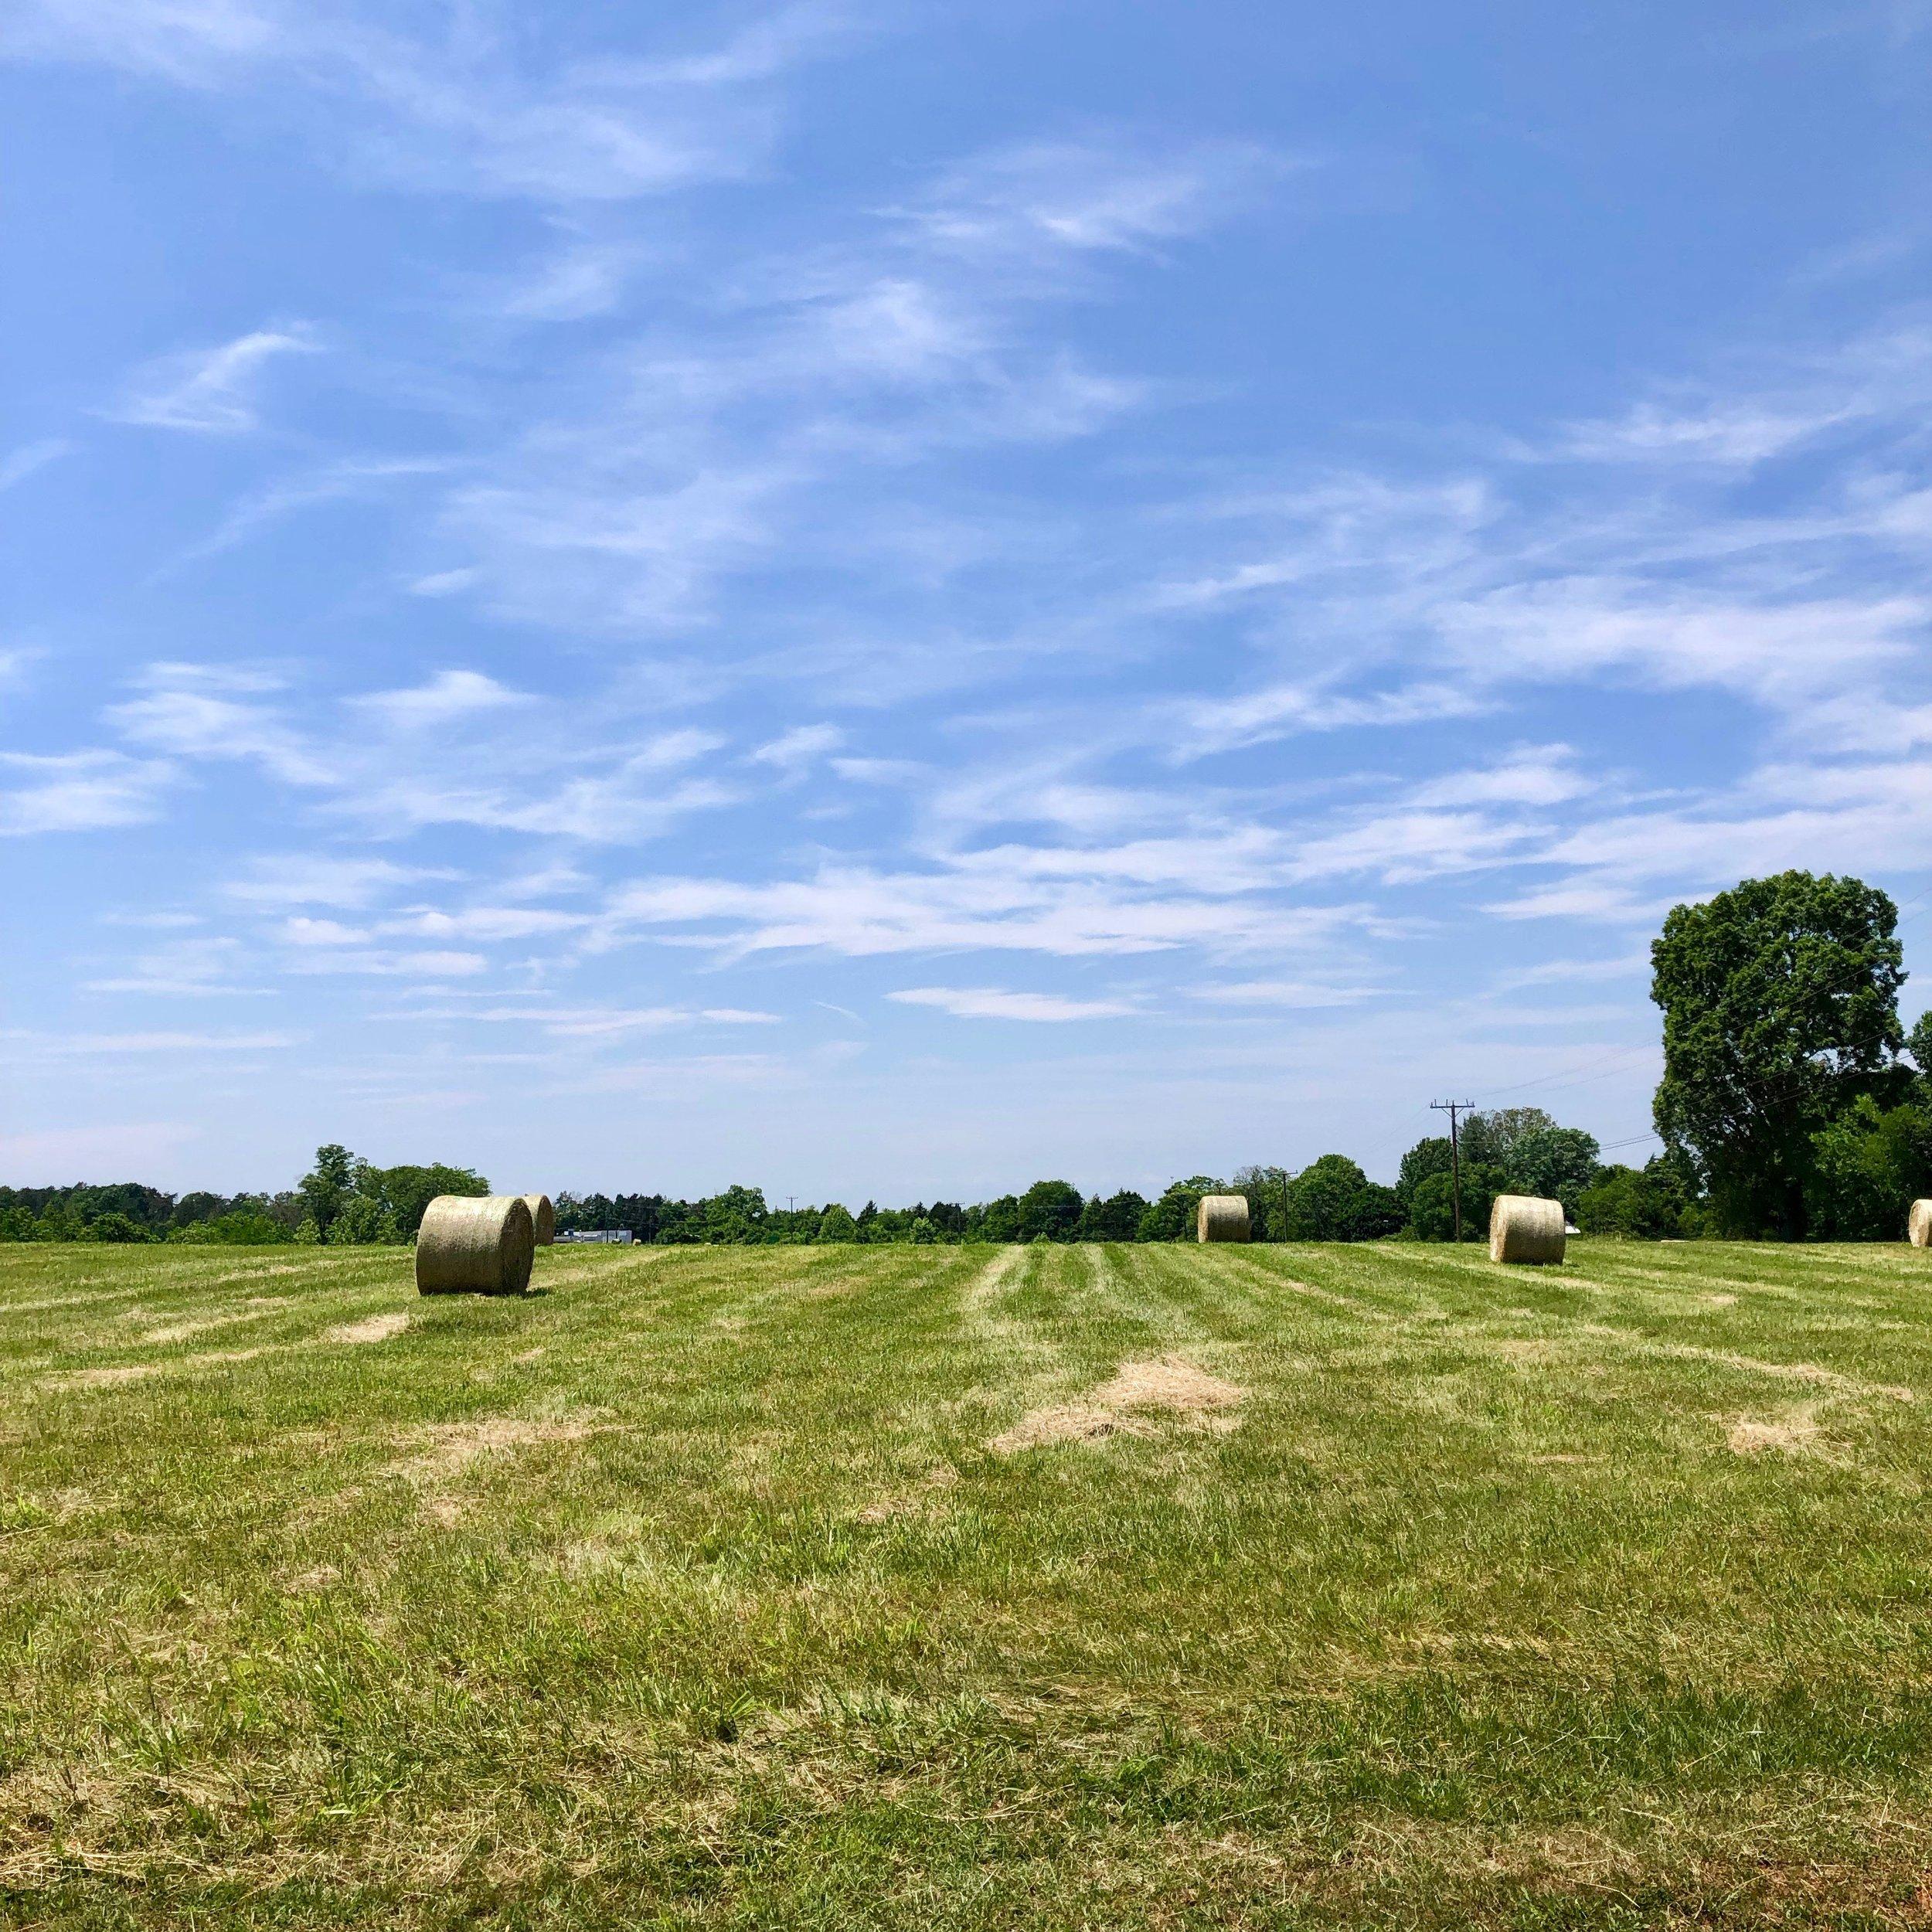 Glimsen-farm-hay3.jpeg